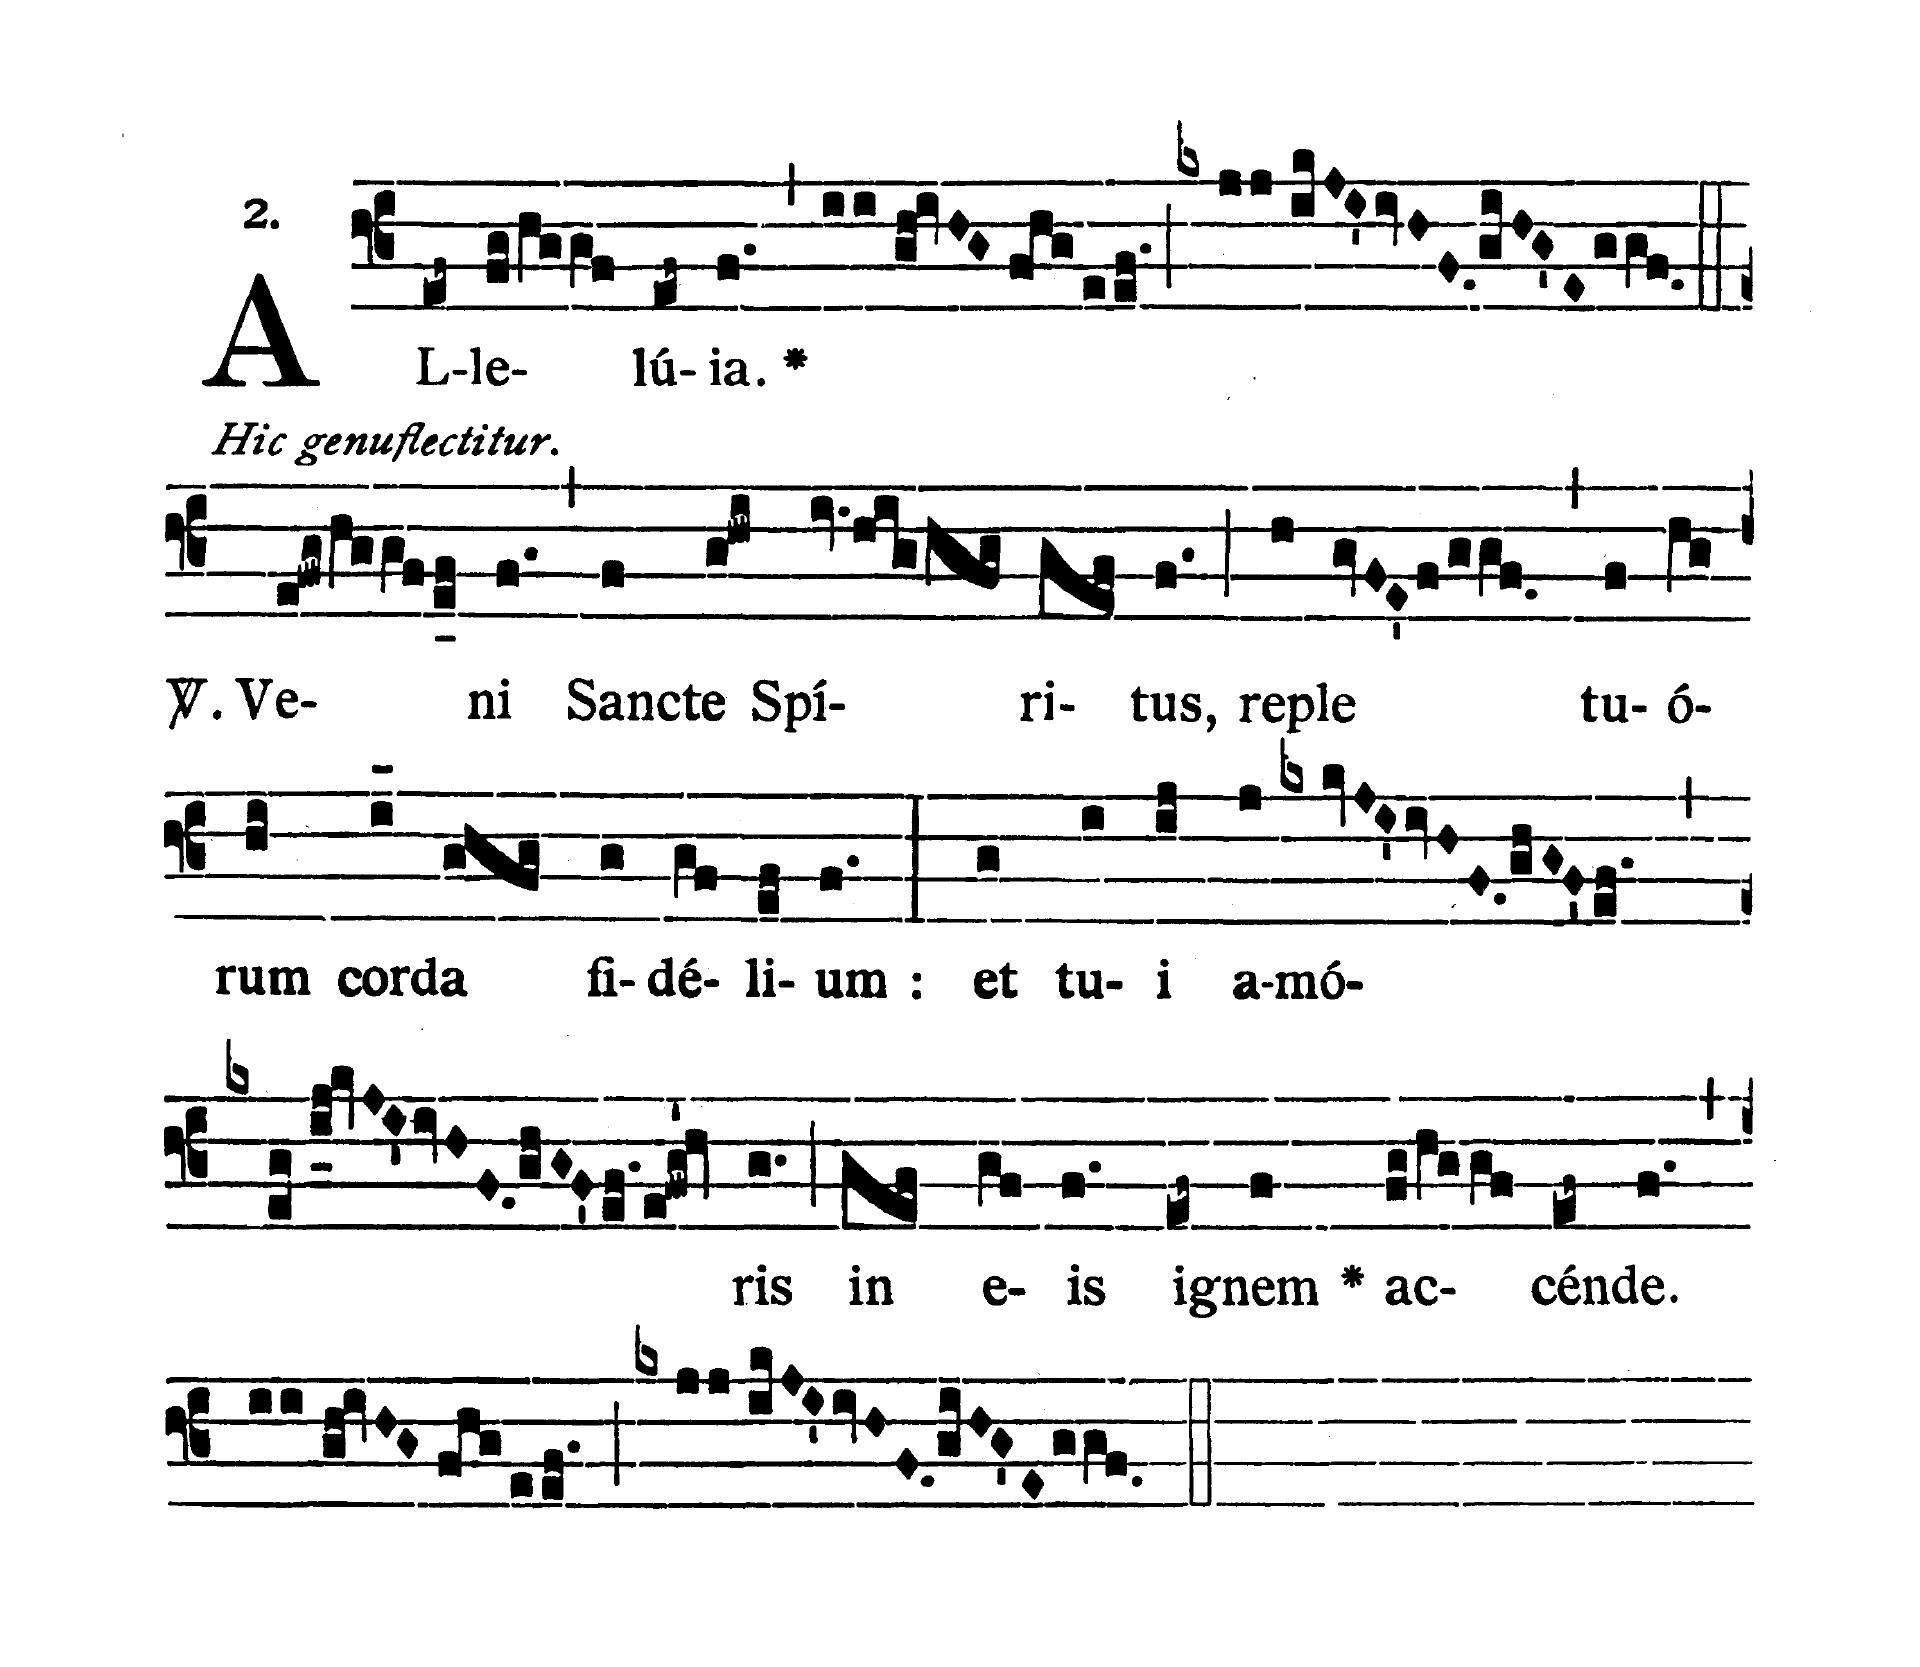 Feria sexta infra Octavam Pentecostes (Piątek w oktawie Zesłania Ducha Świętego) - Alleluia secunda (Veni Sancte Spiritus)